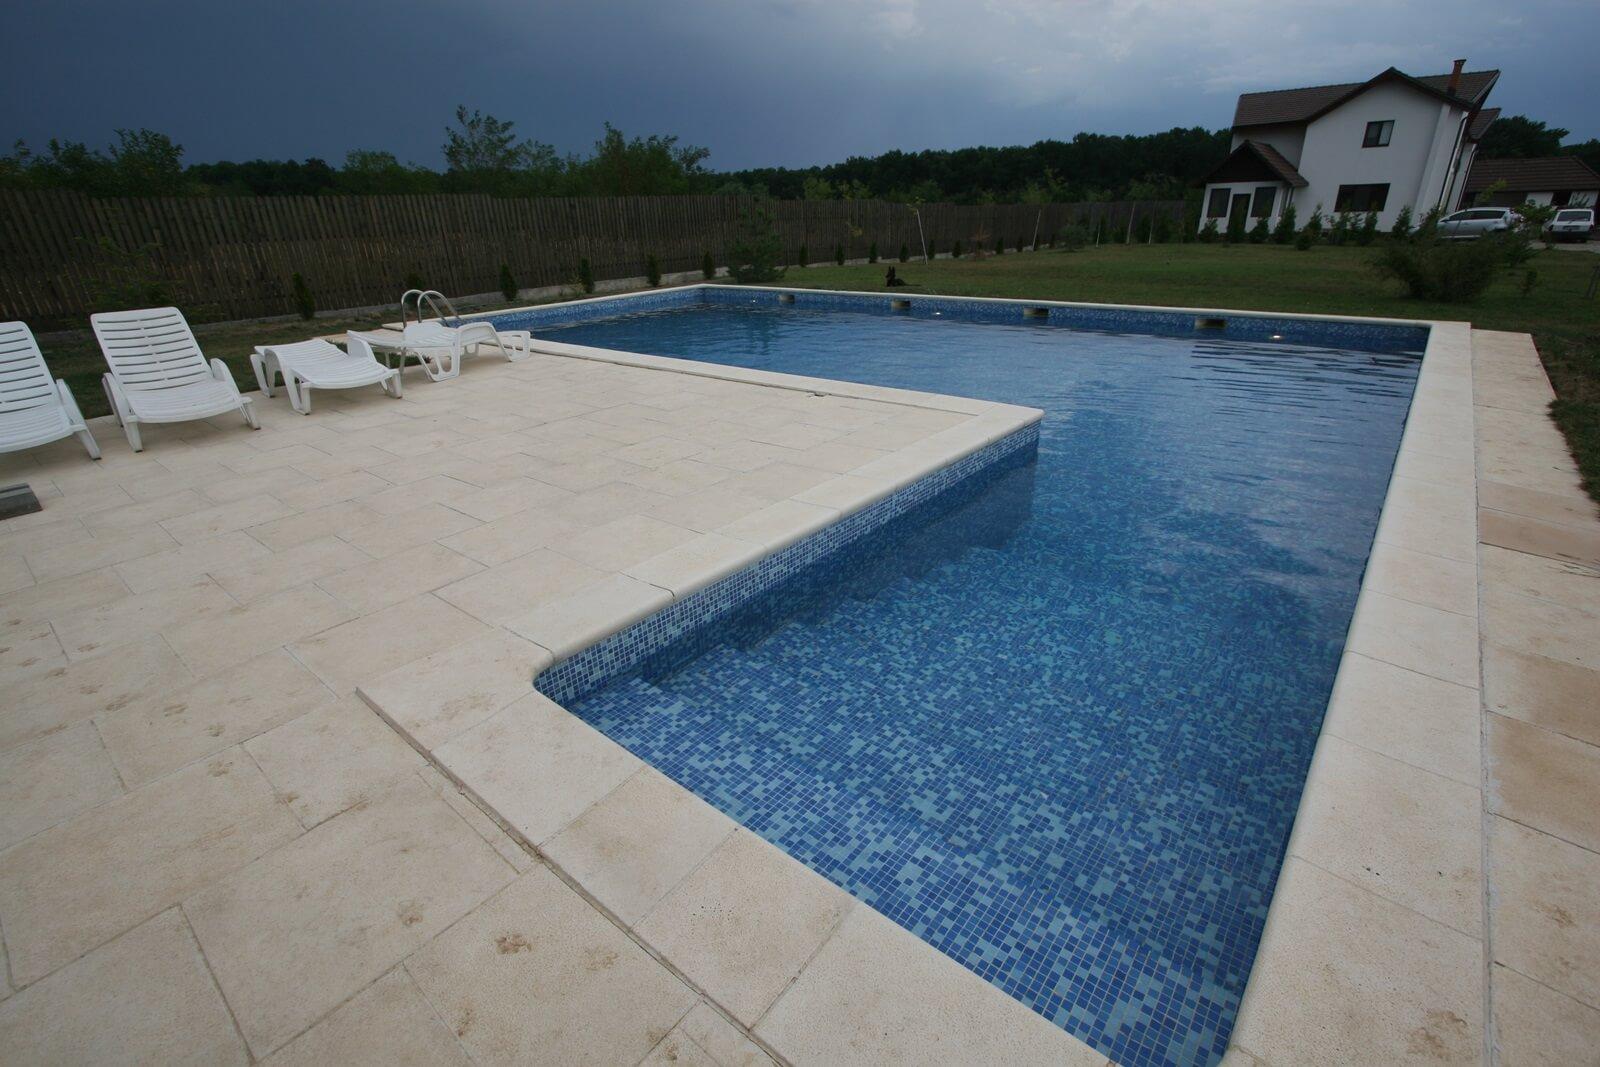 Piscina din beton cu skimmer cu vitroceramica piscine for Construim piscine